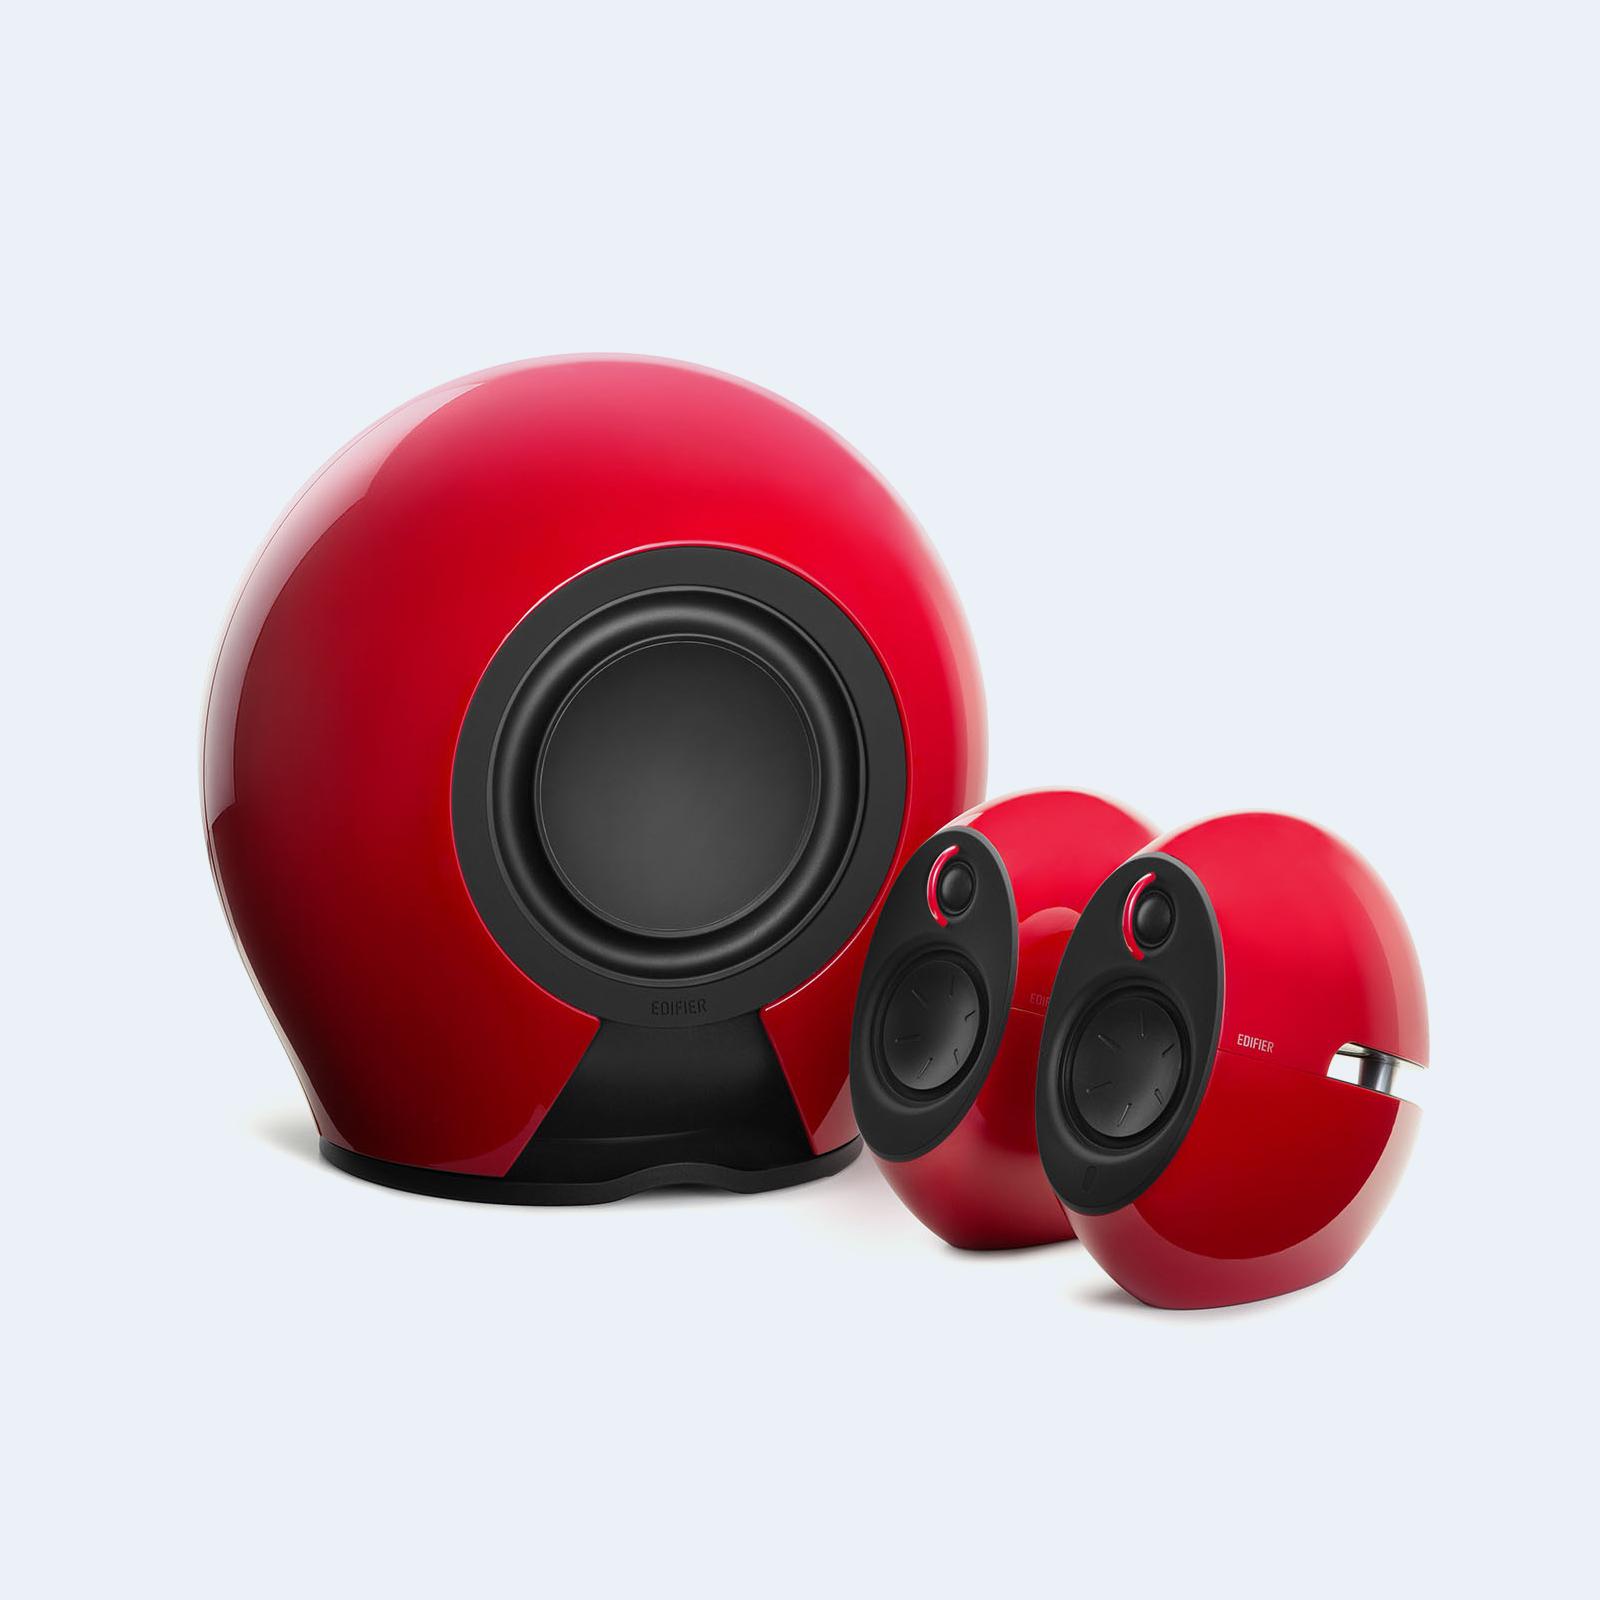 Clearance on Edifier products: earphones, headphones, earbuds, Neckband, over-ear, bookshelf